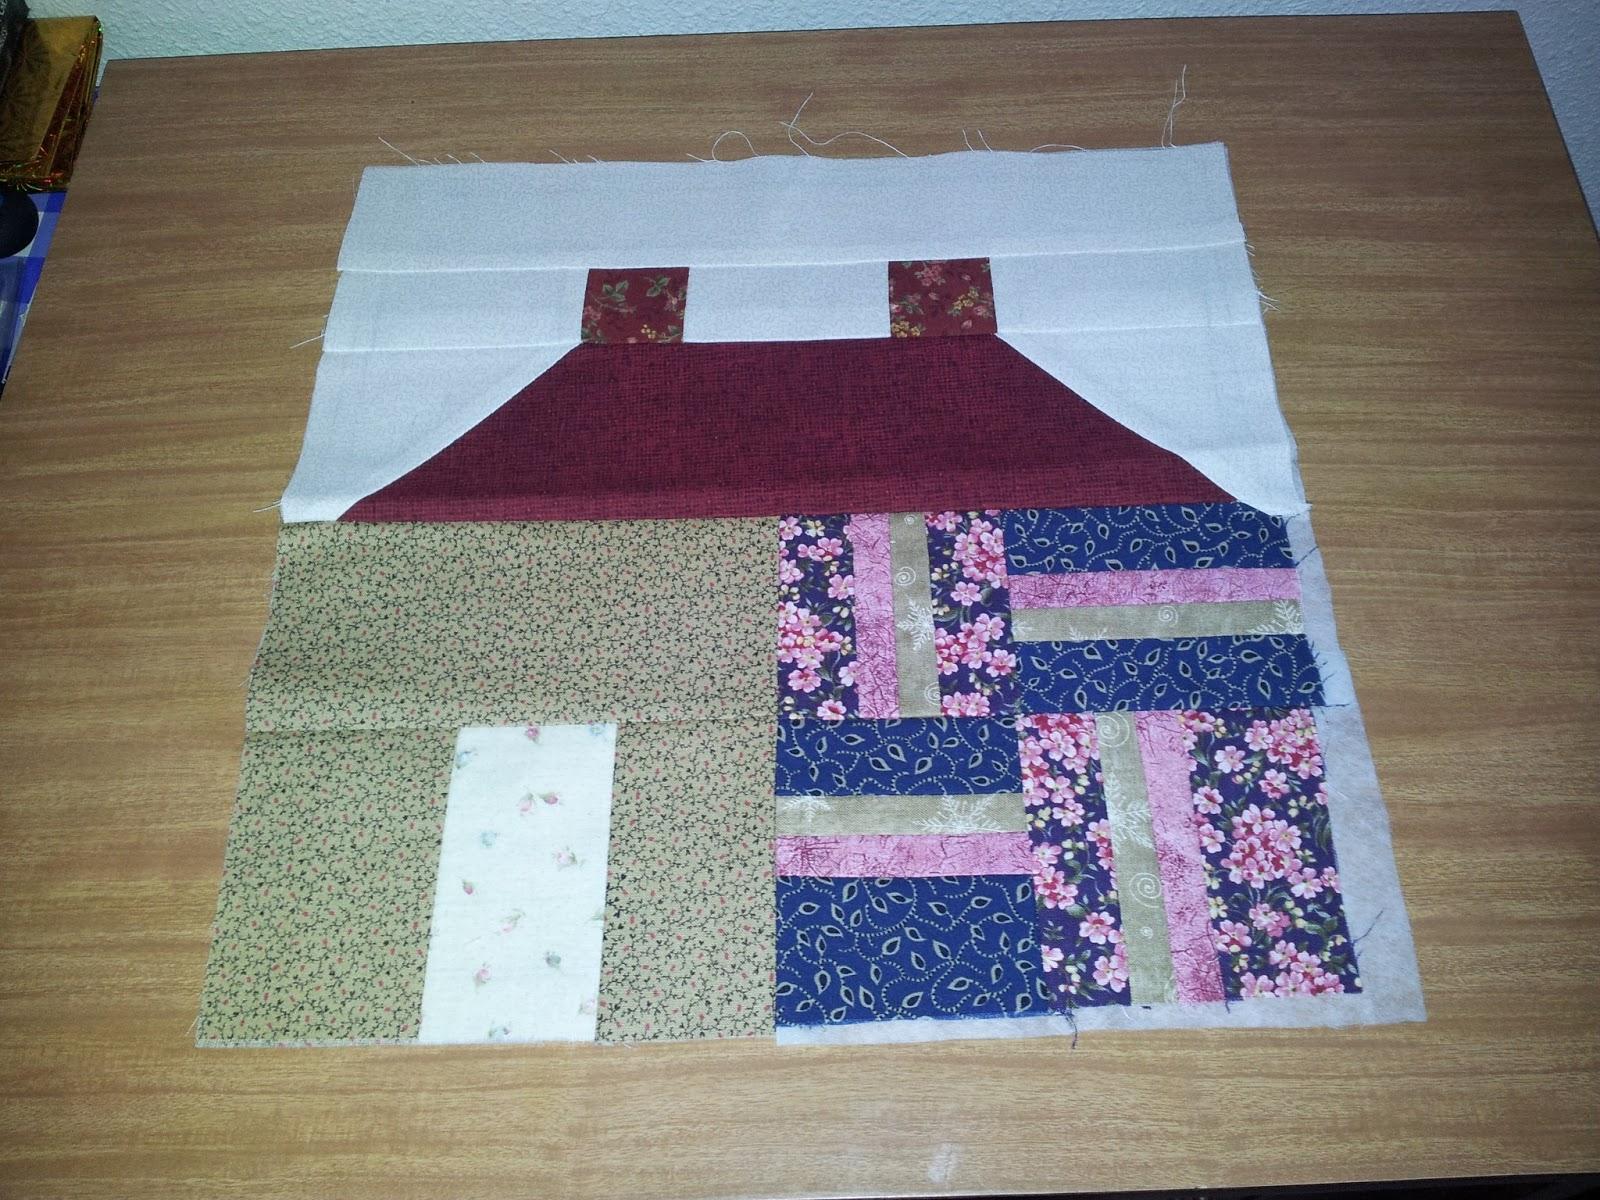 Casa de patchwork 2 de paseo con moni - Casas de patchwork ...